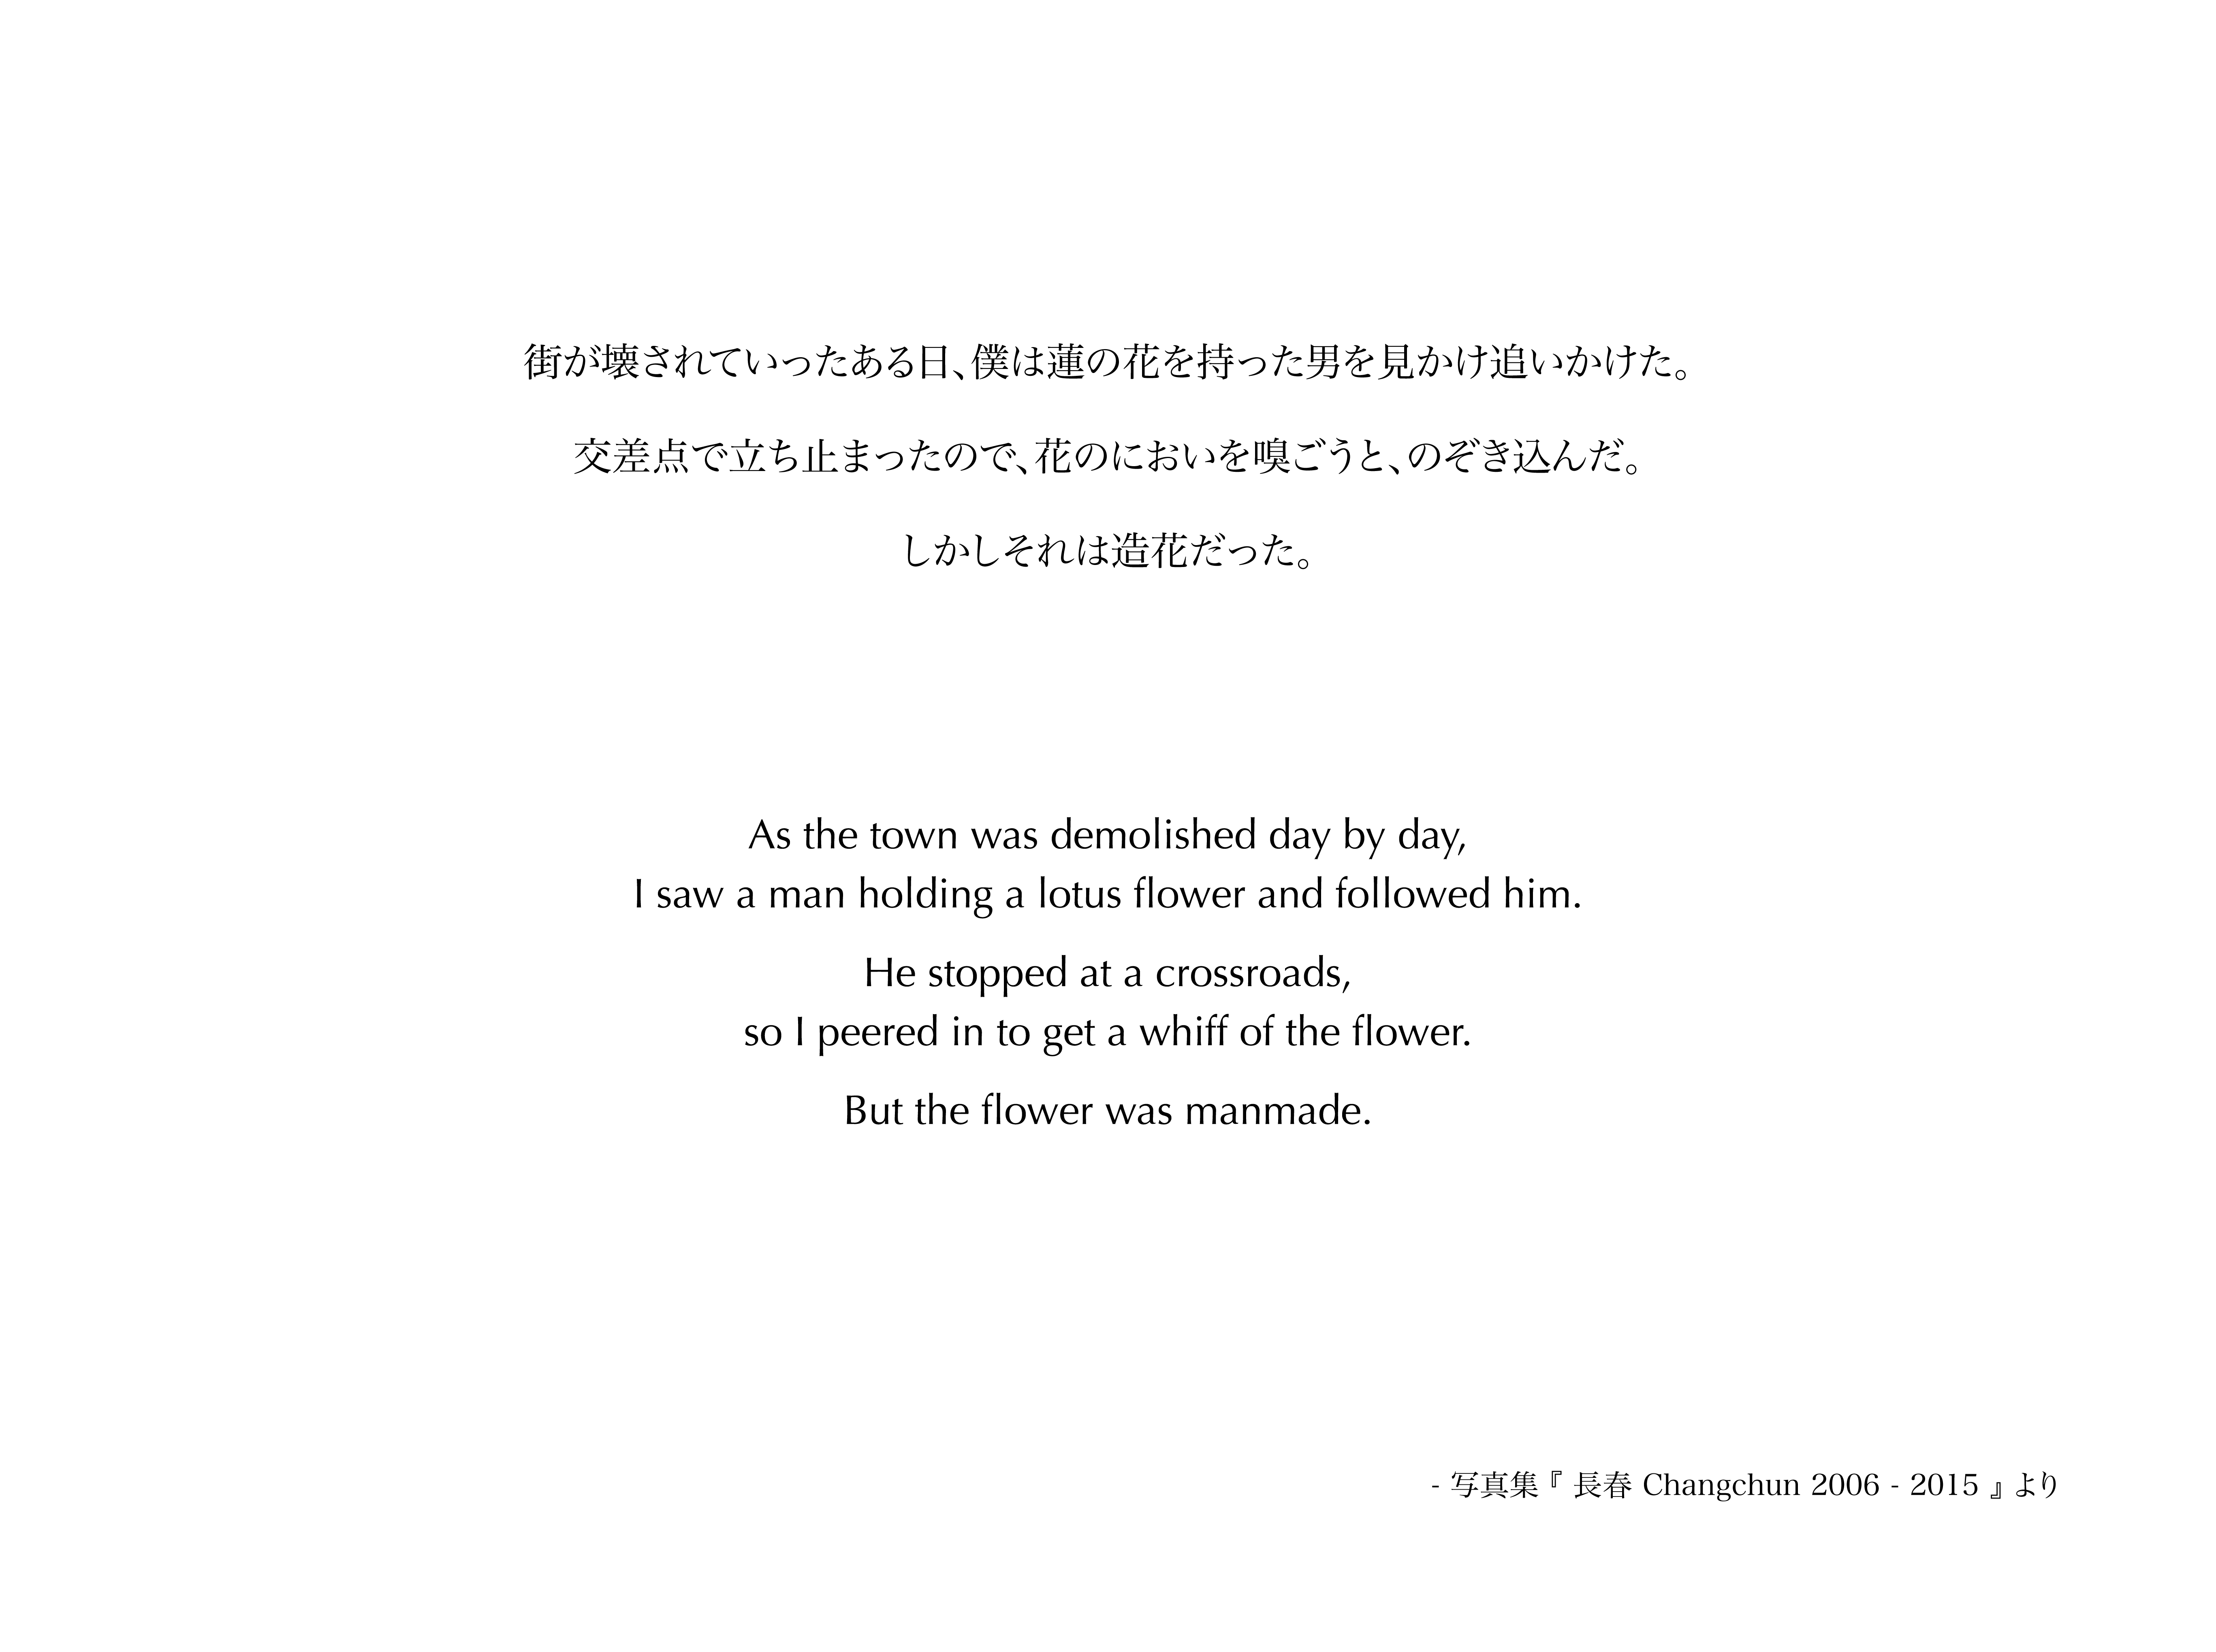 changchun_text